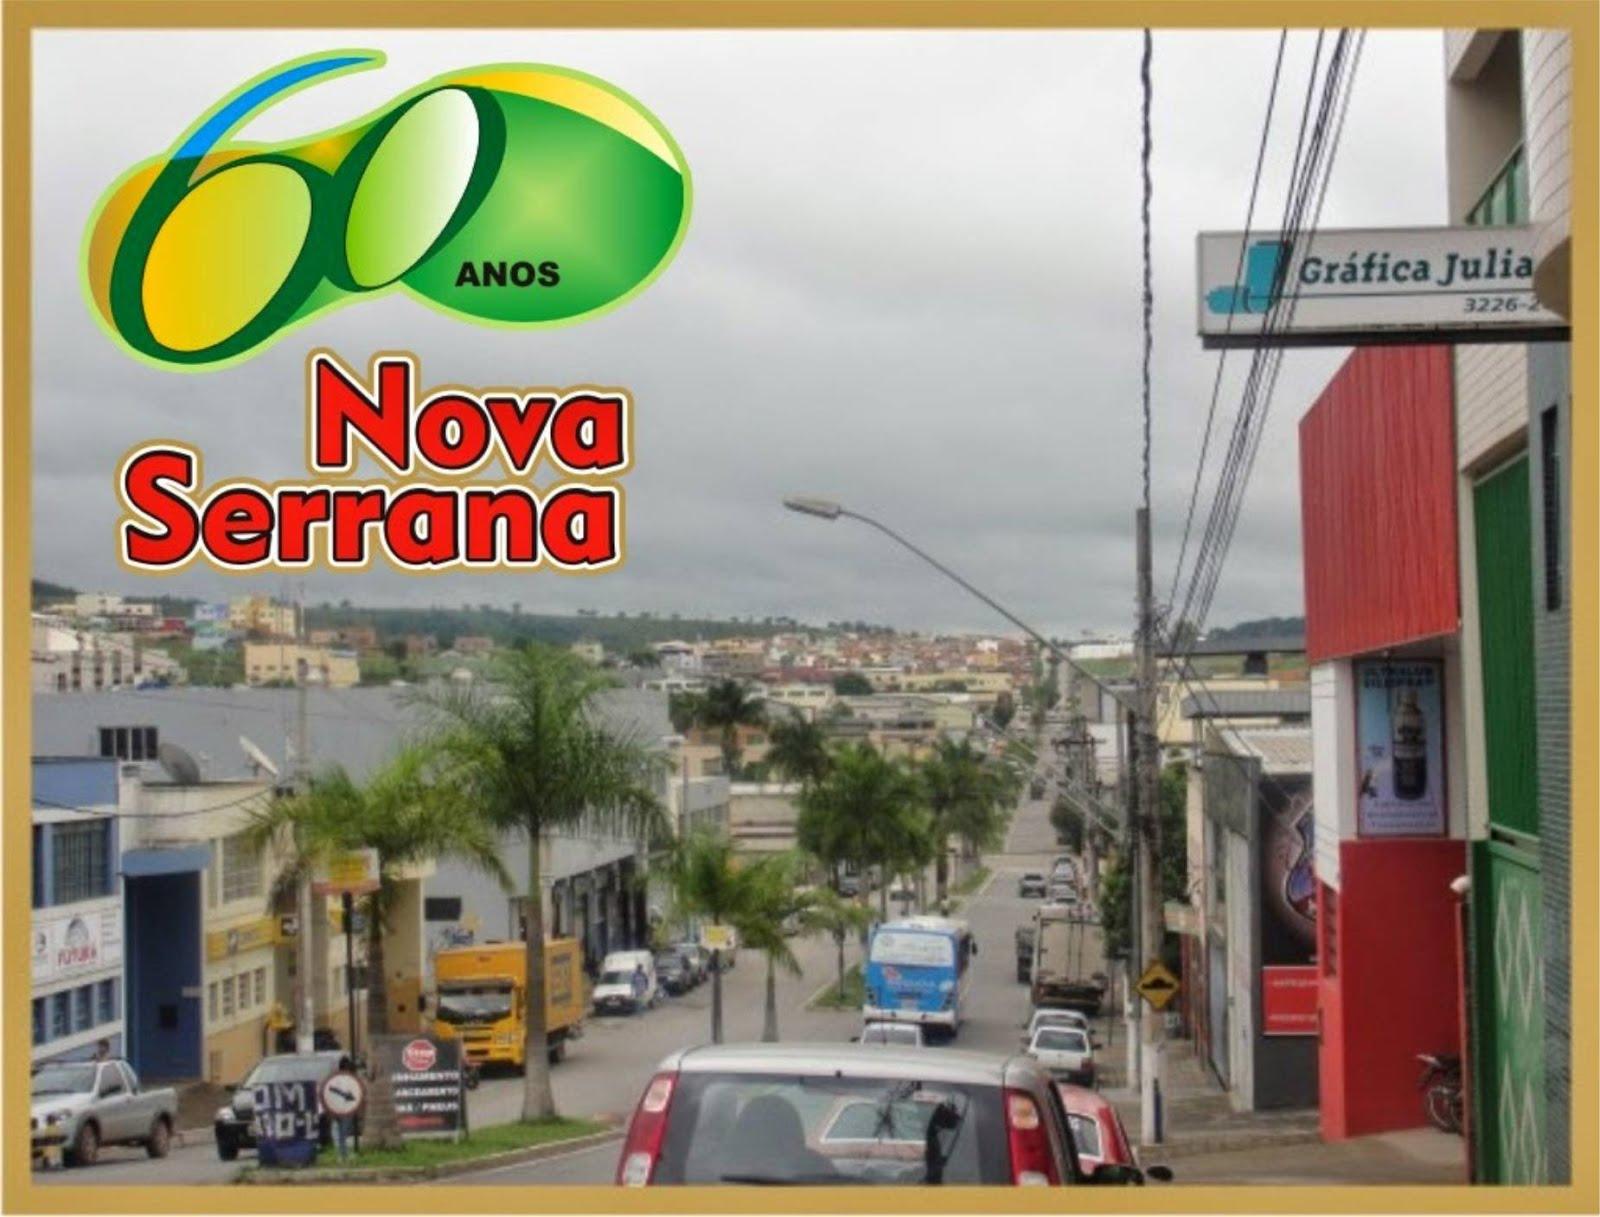 Nova Serrana em 2014